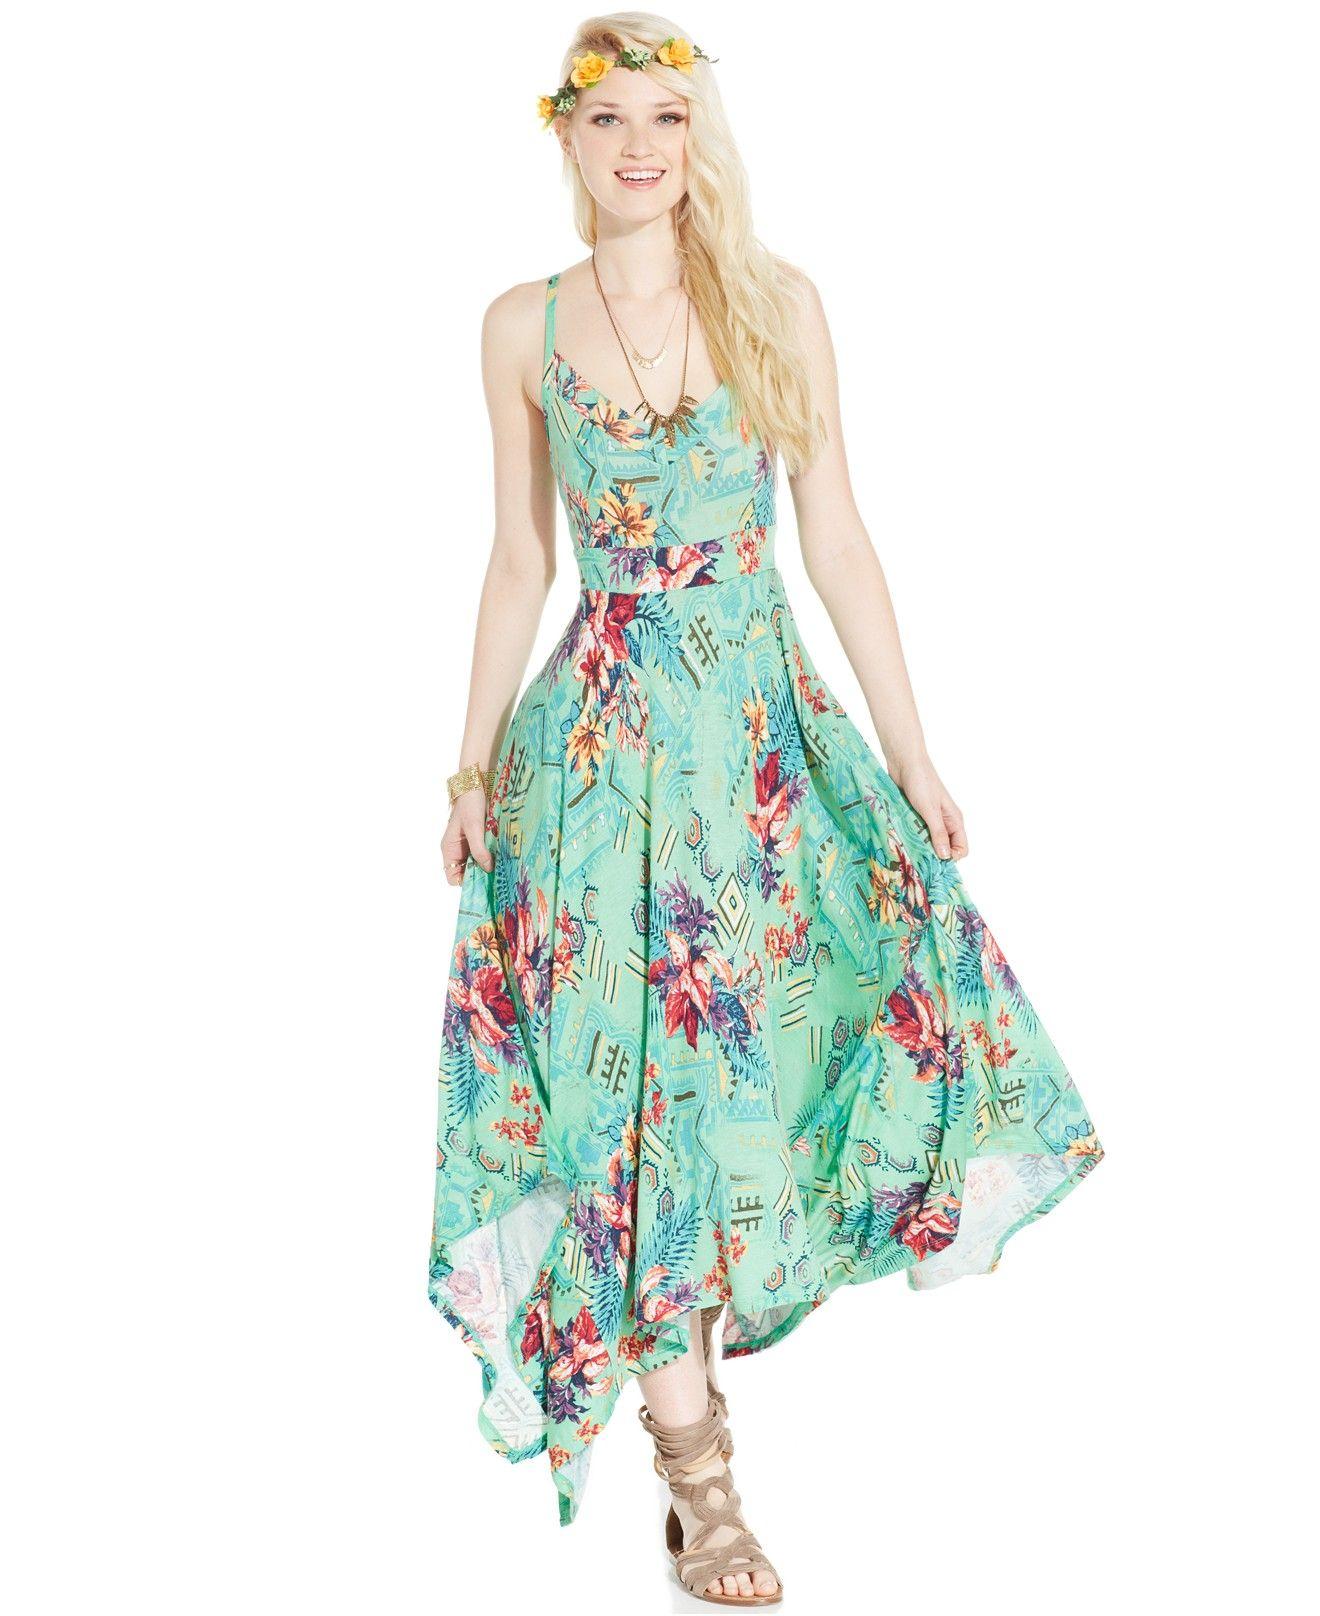 cd83231f0cc3 American Rag Printed Handkerchief-Hem Maxi Dress - Dresses - Women - Macy's  Color: Gilligan's Island